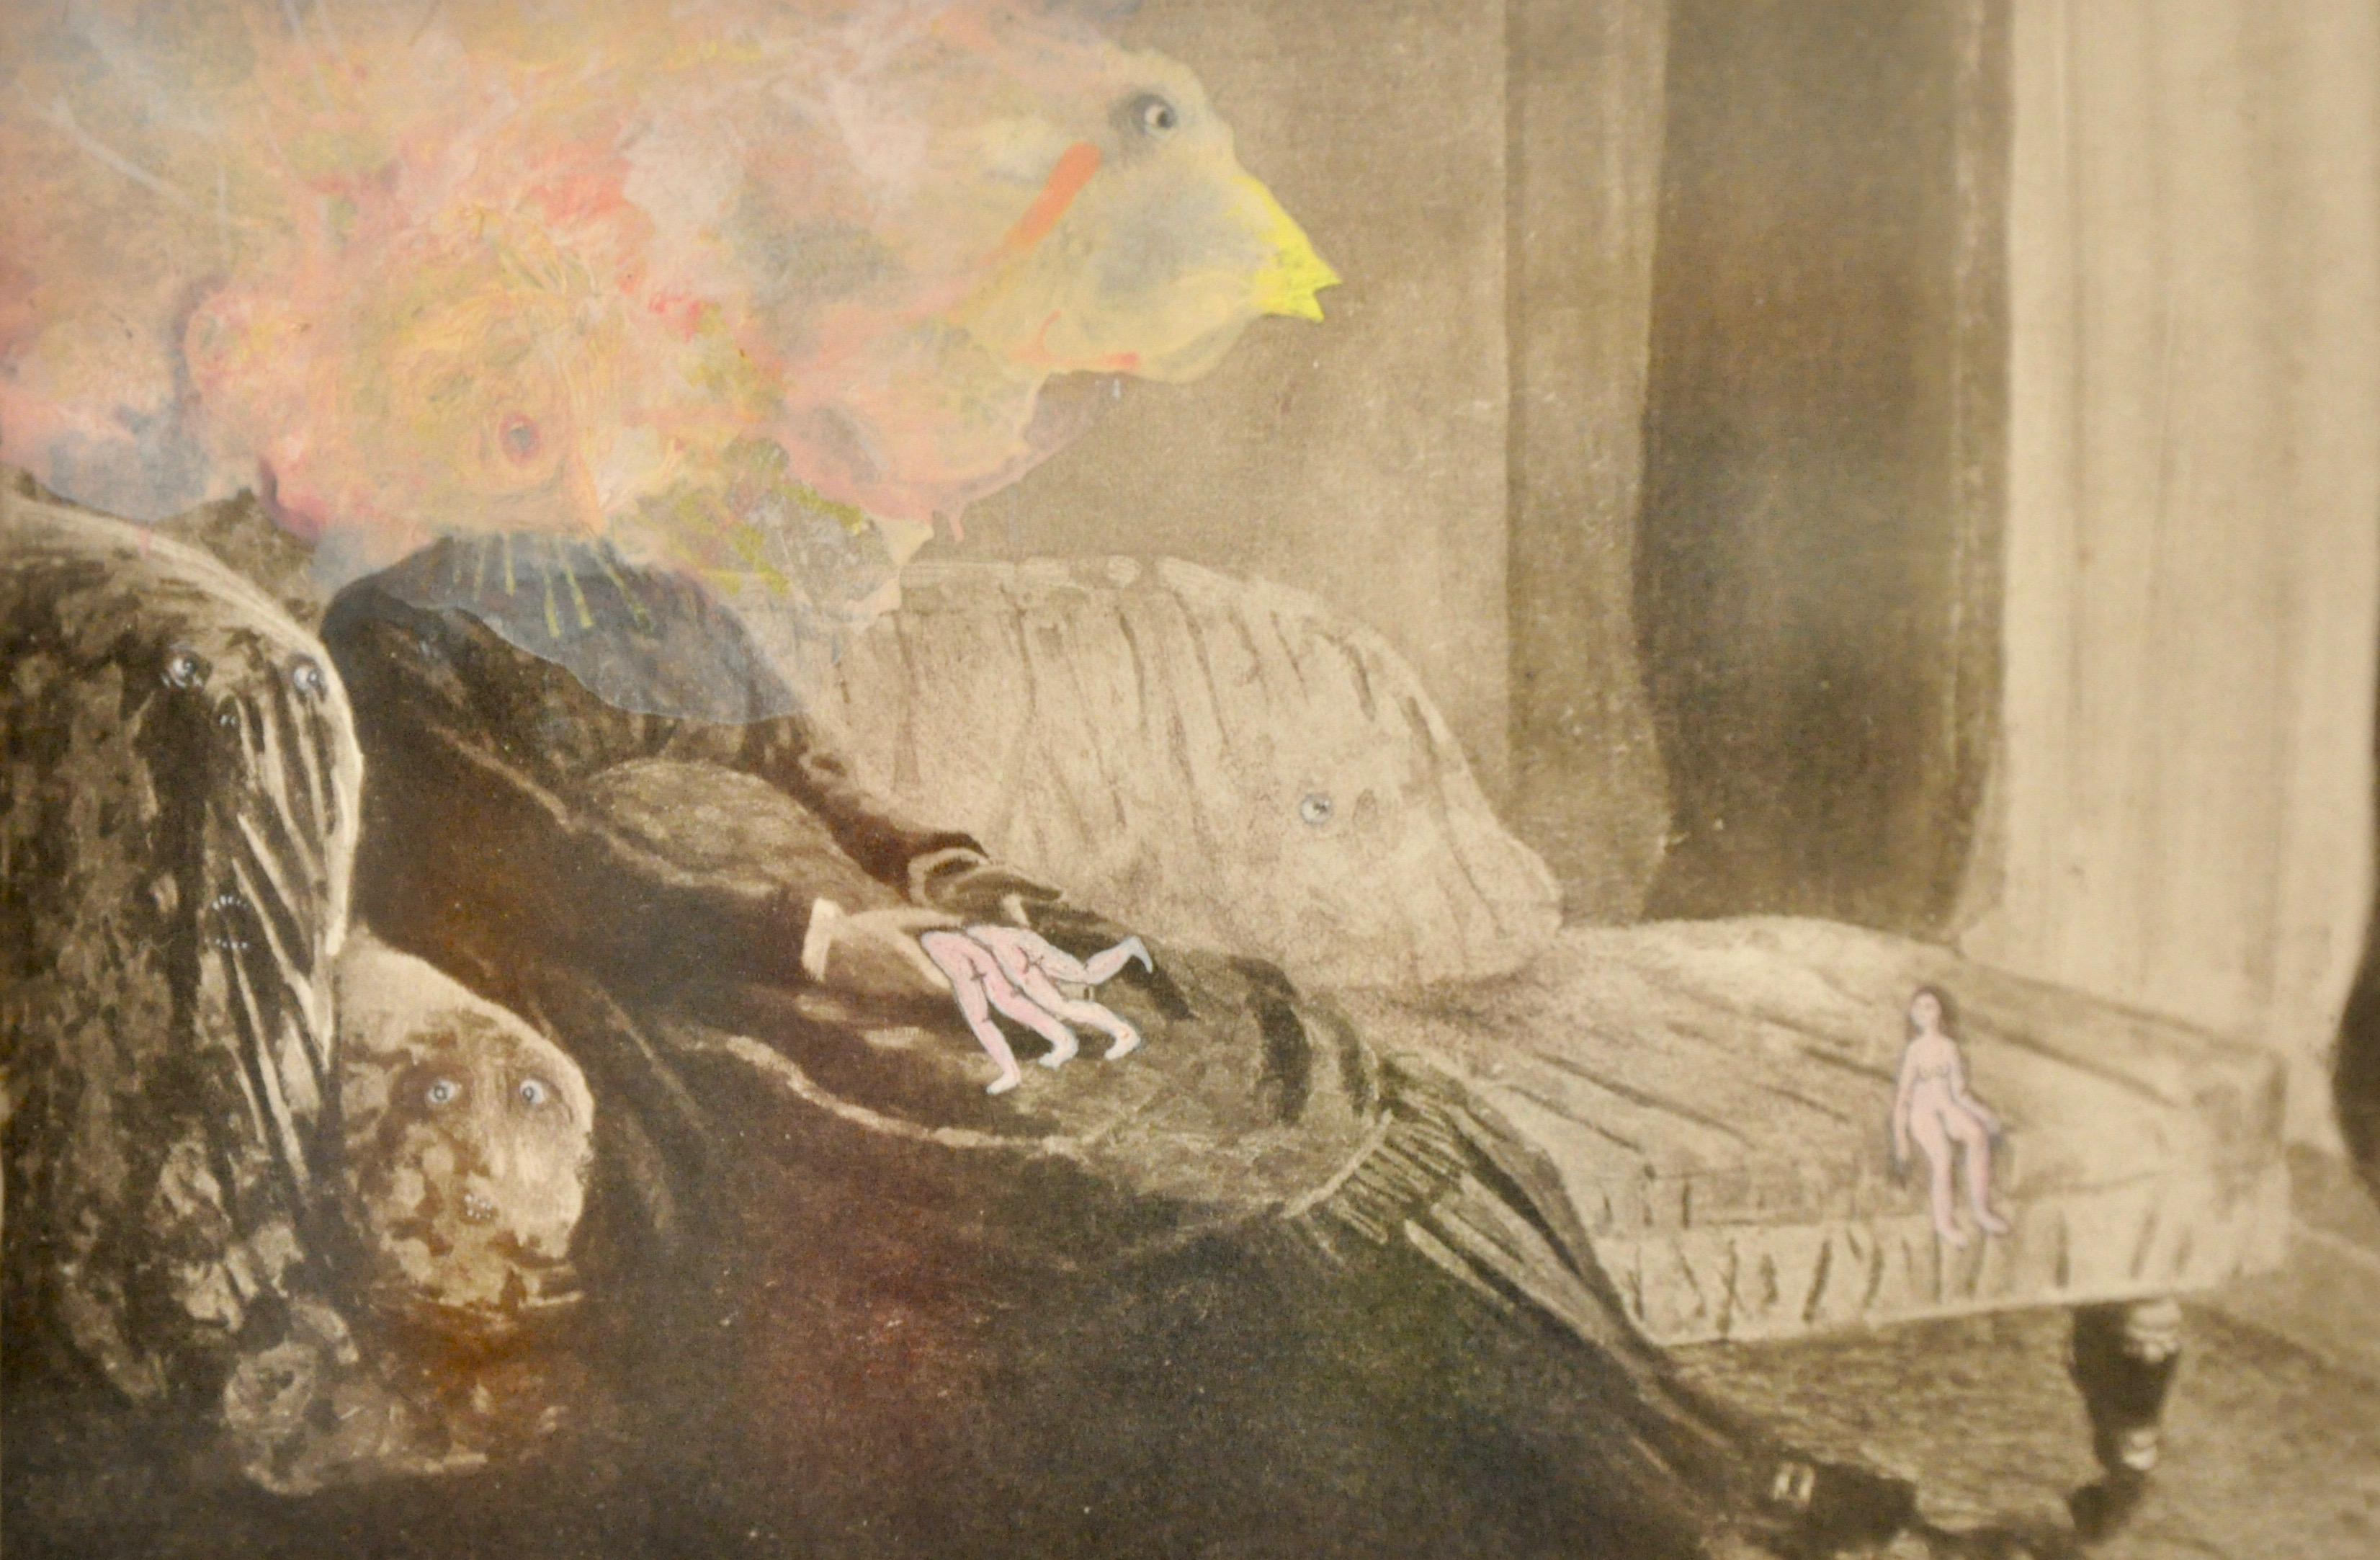 Karin Rougier, U.T. (Ghosts/Depression 2016)